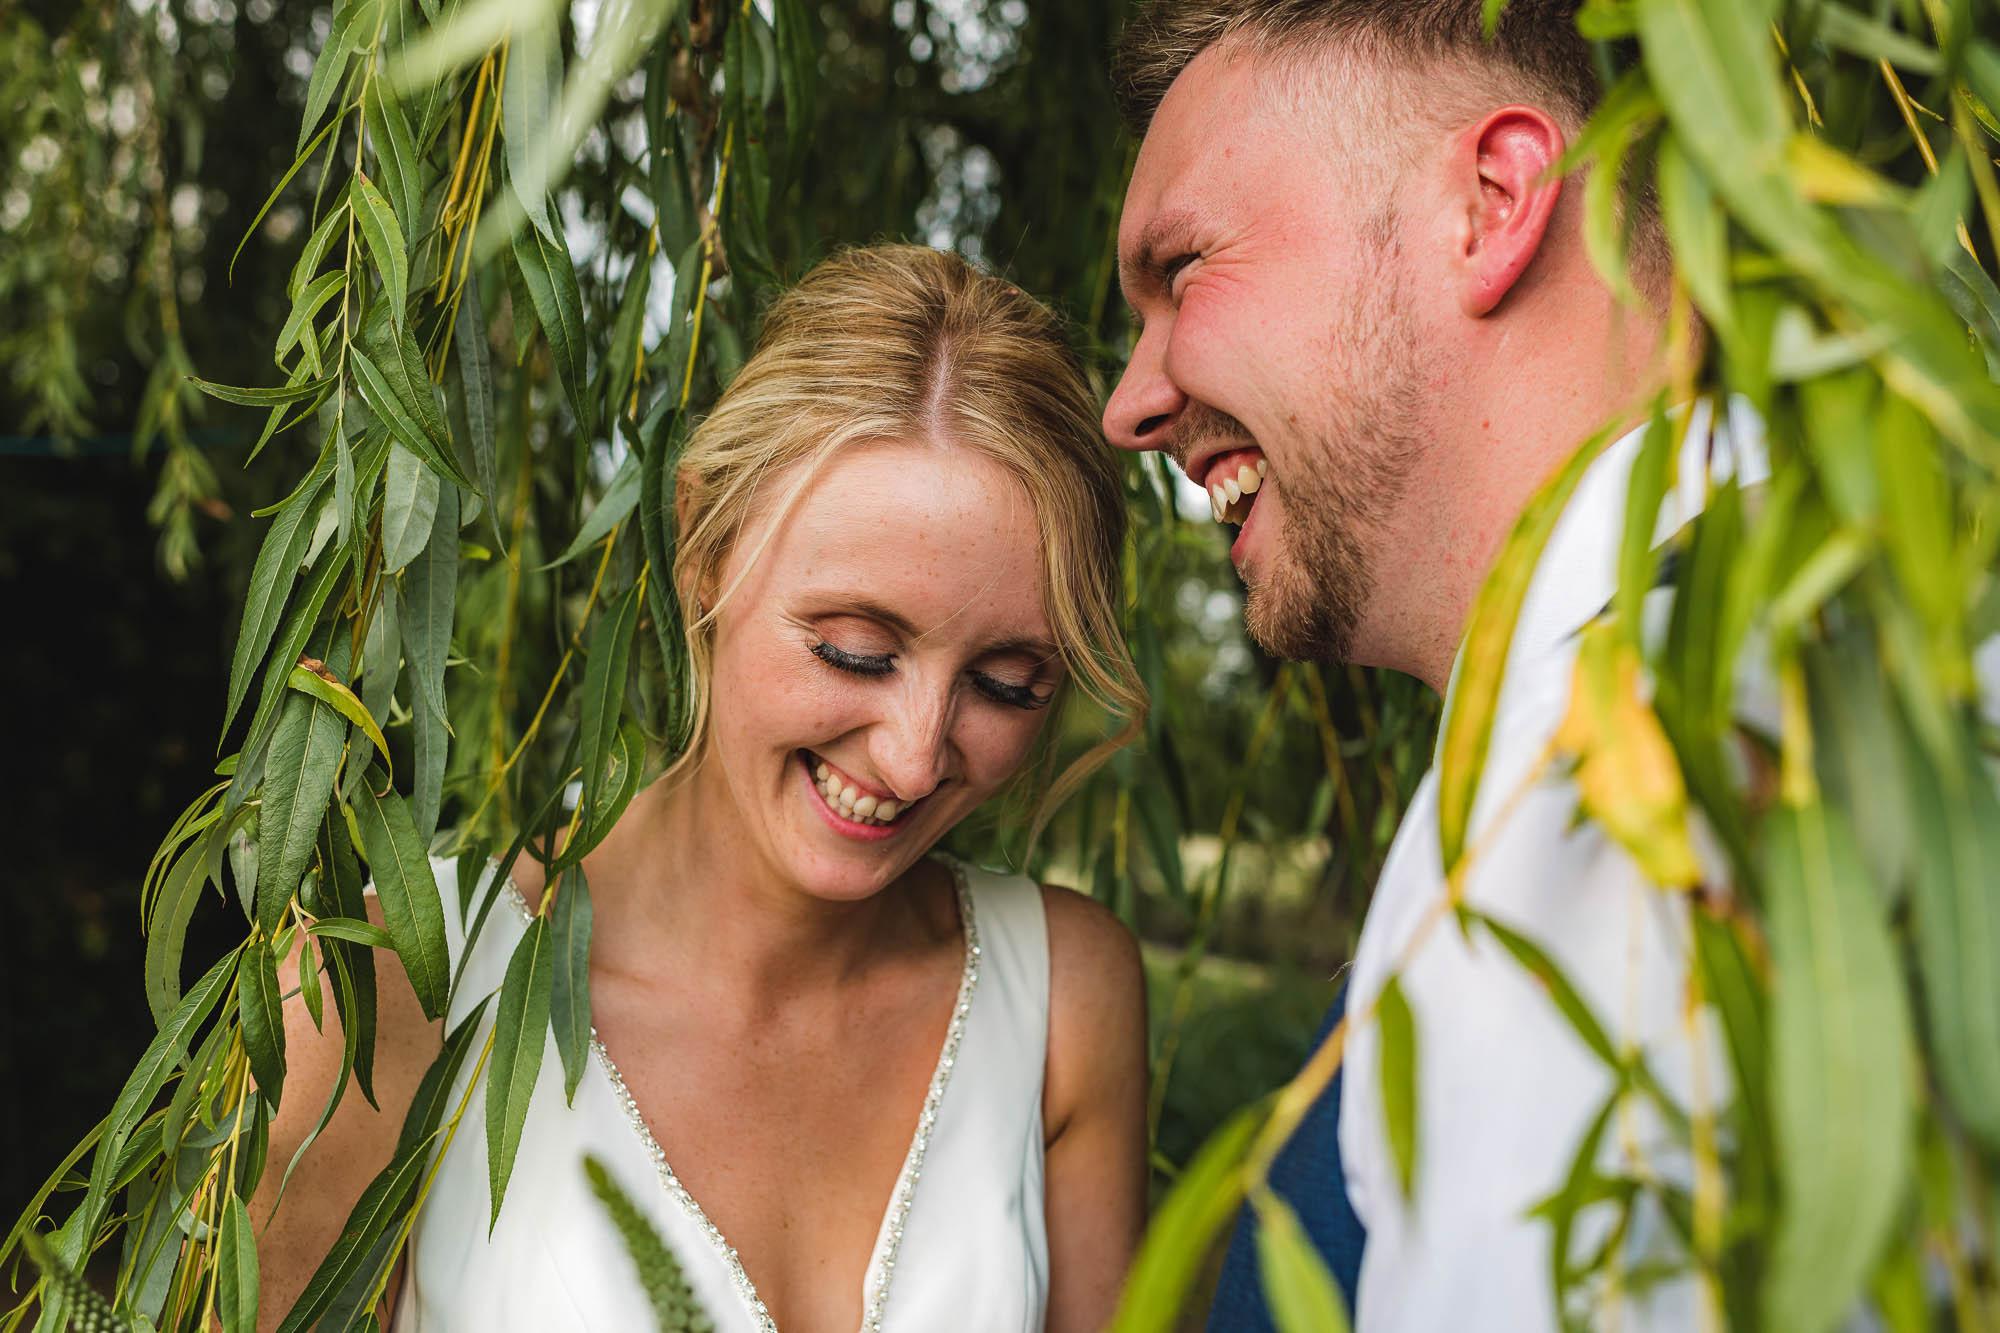 Burwash Manor wedding – Alannah & Ashley